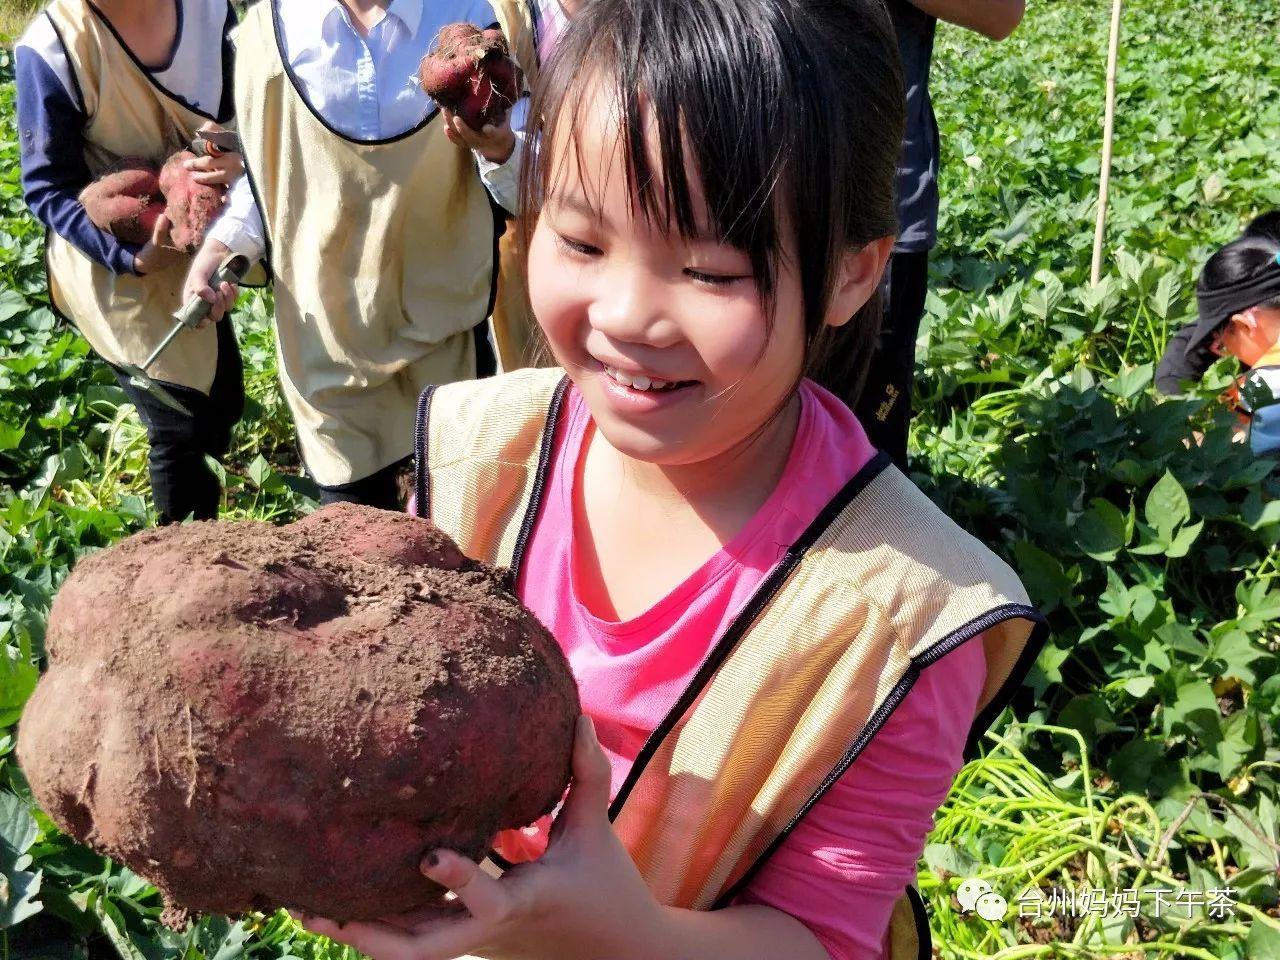 番薯学院【www.fanshuxueyuan.com】七大地网站目录